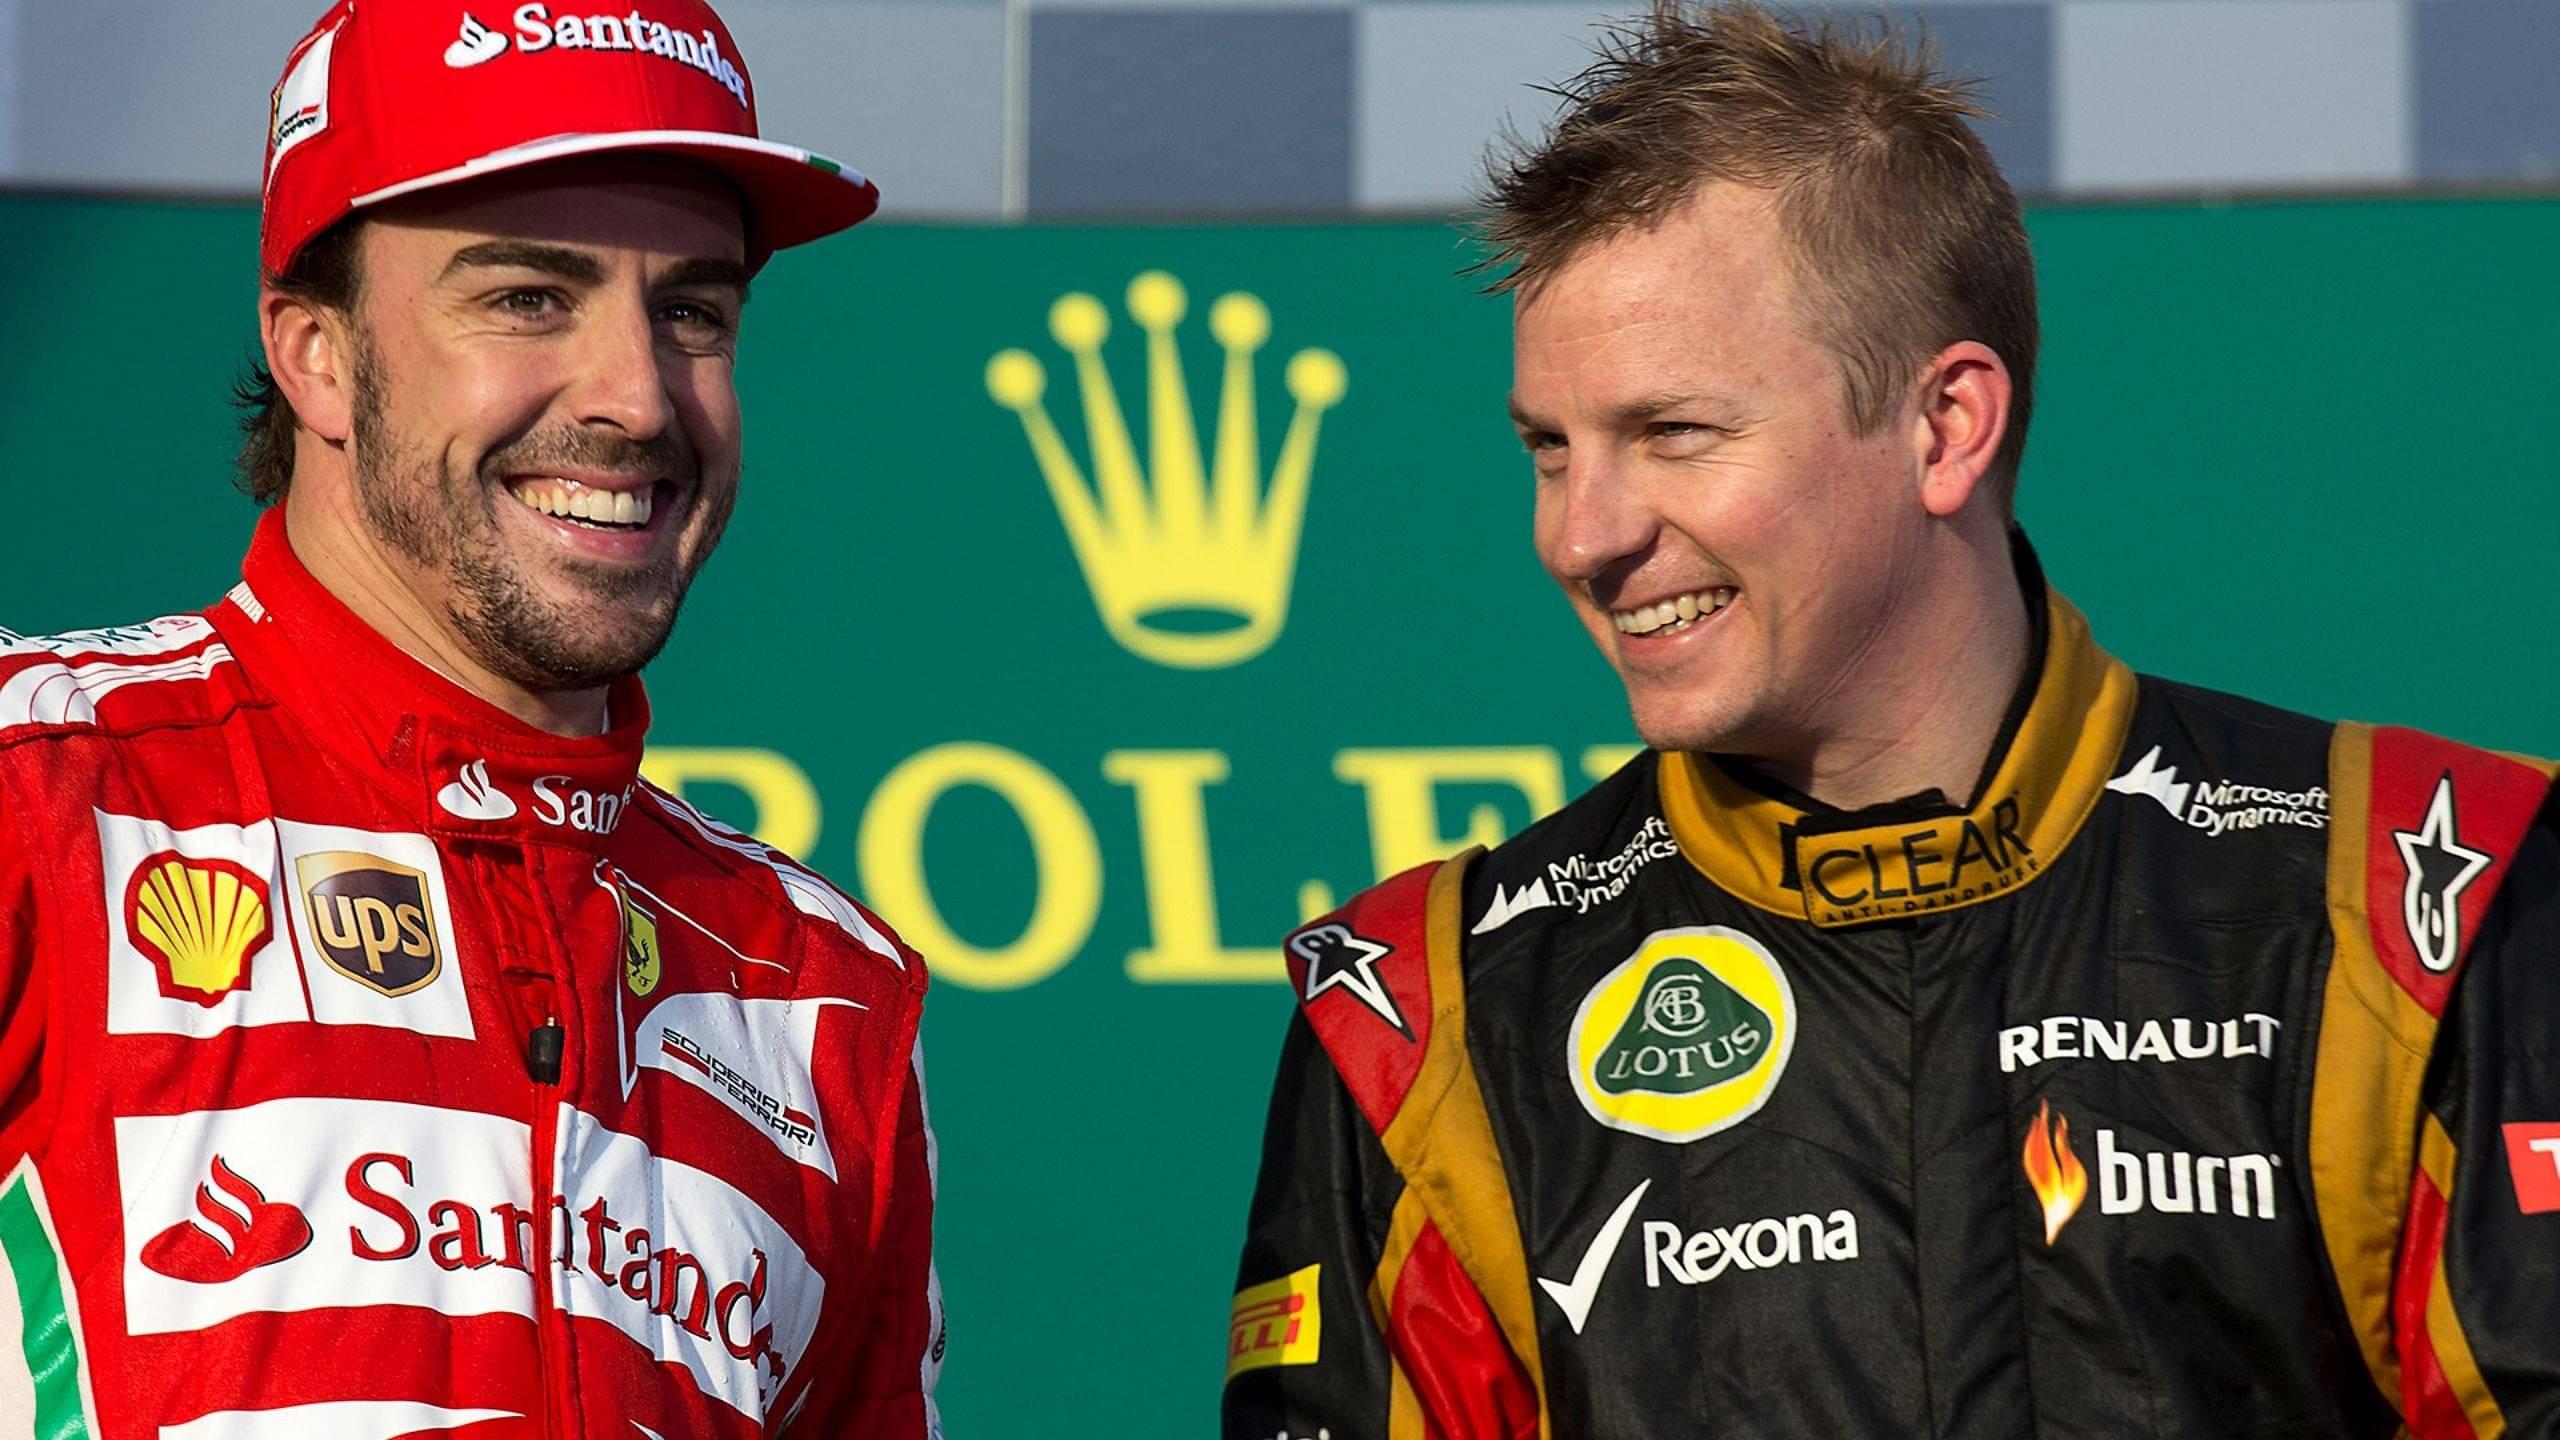 """We spent more time together"" - Romain Grosjean reveals his favorite teammate between Kimi Raikkonen and Fernando Alonso"